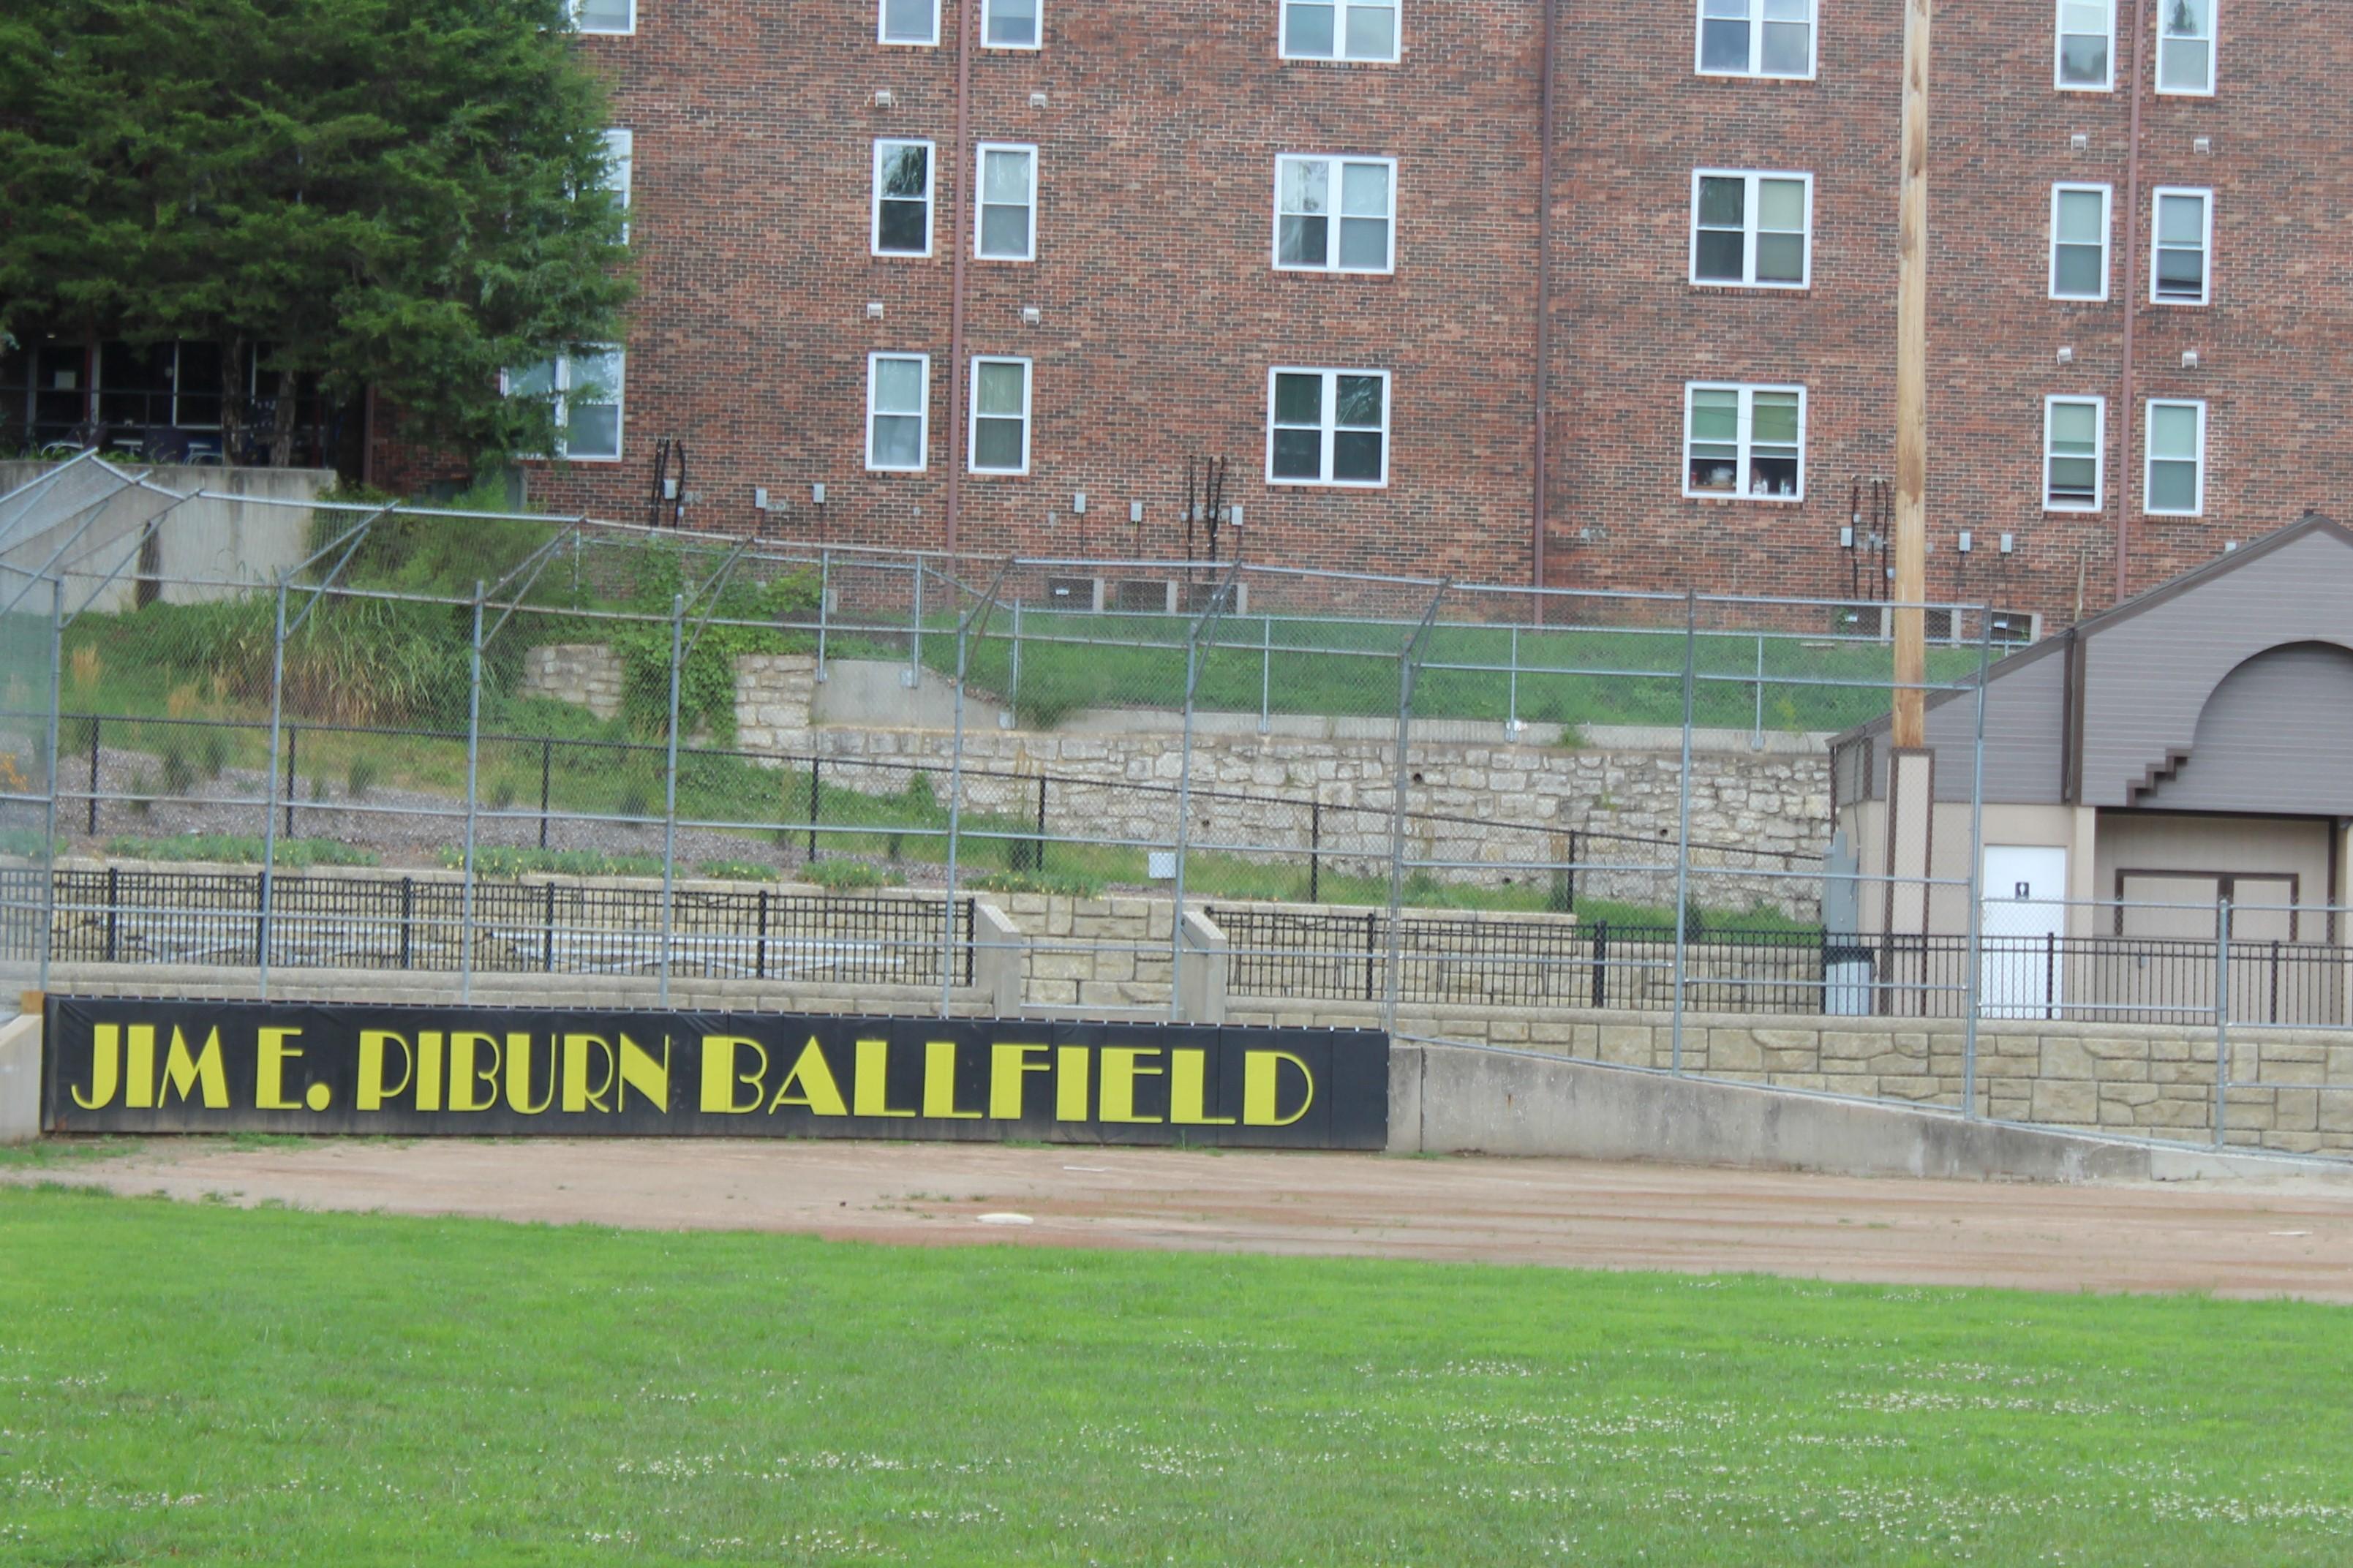 Jim E Piburn Ballfield